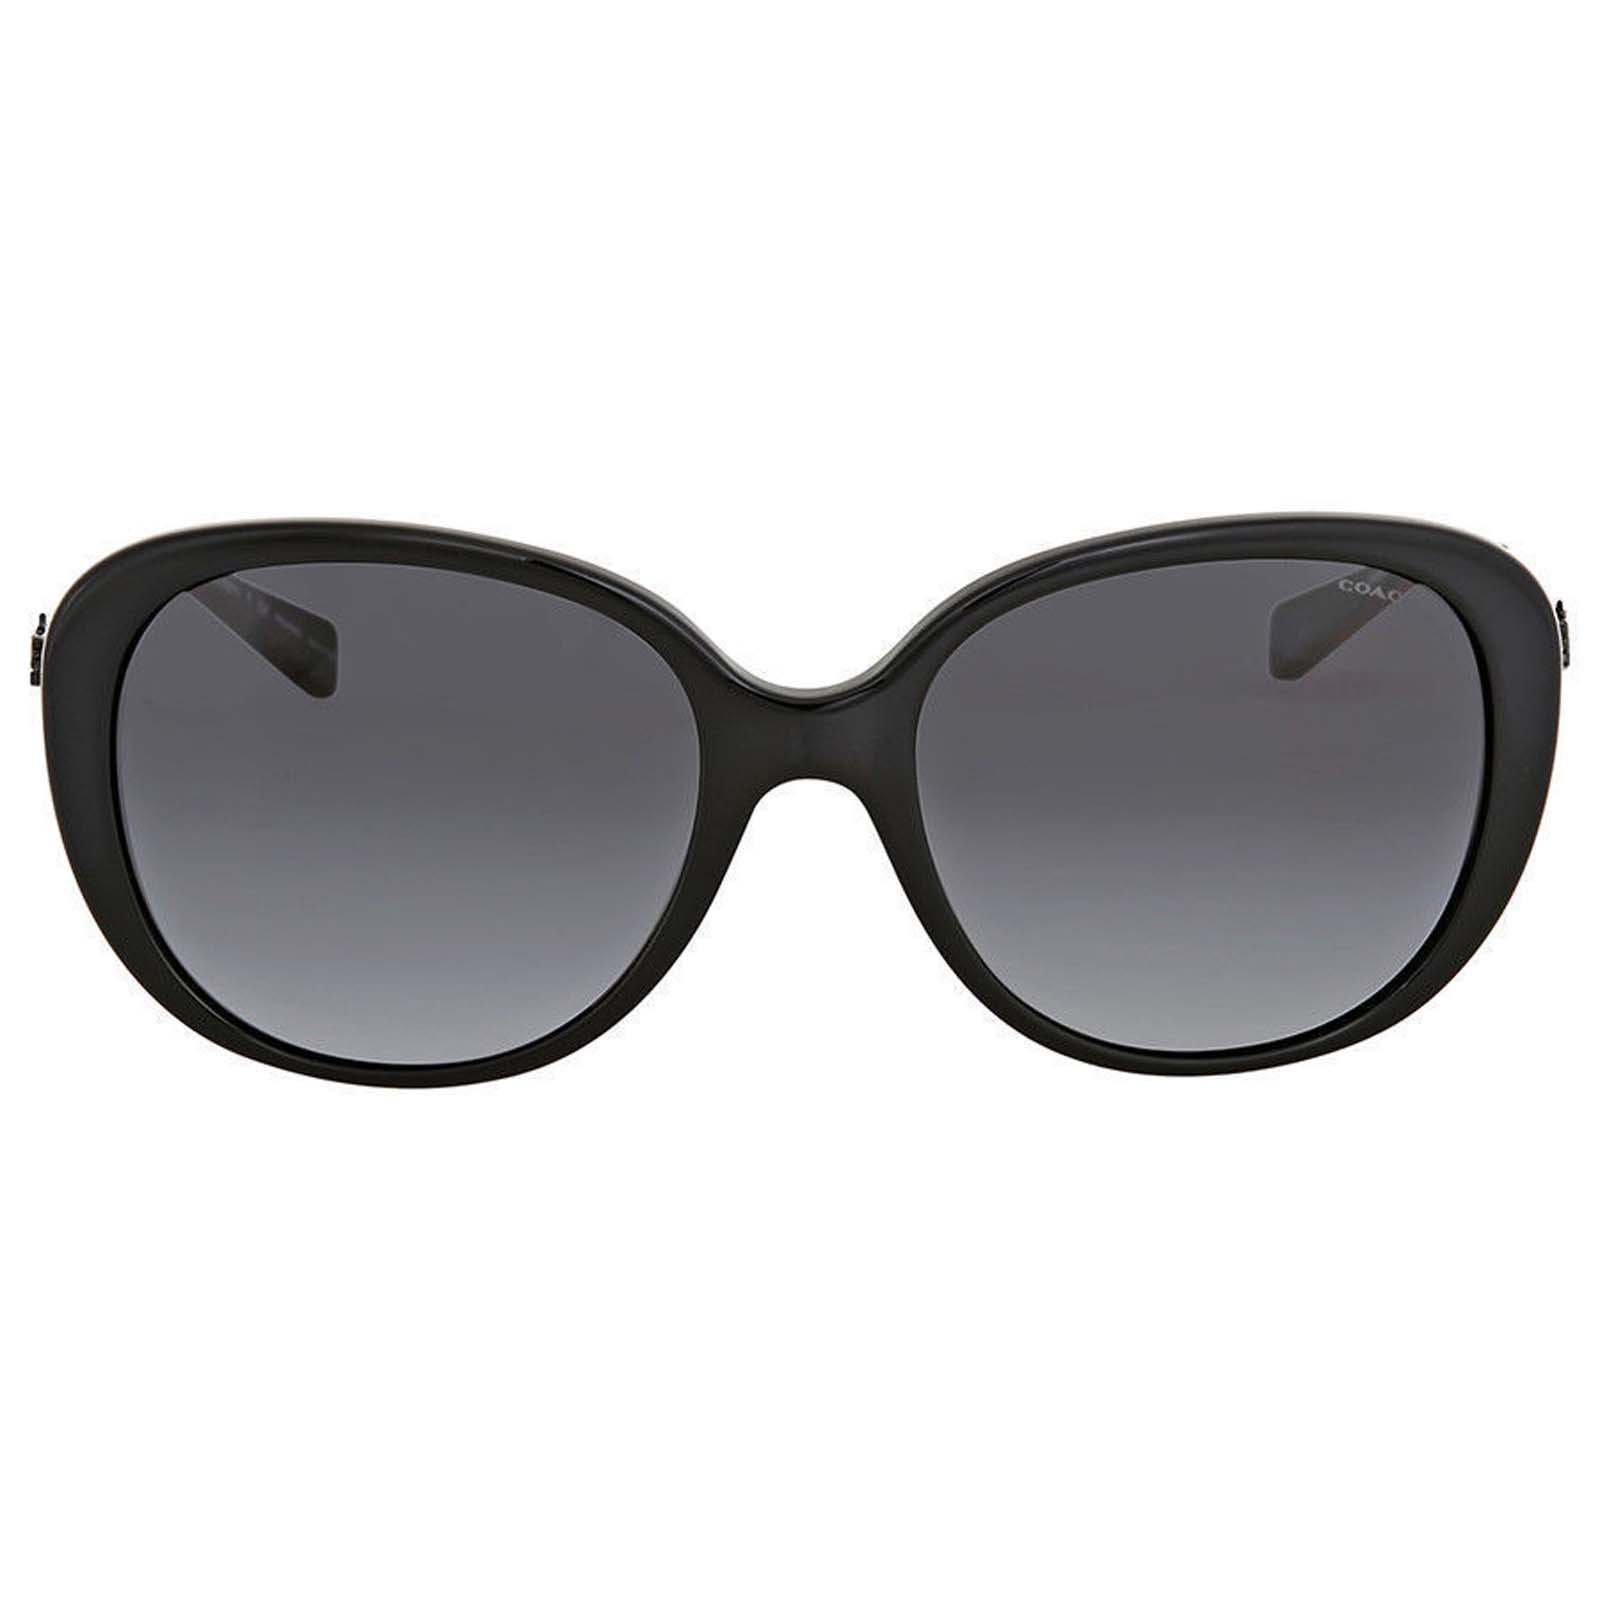 b3aab9aca9d67 Coach HC8215 5482T3 L1651 Black Sunglasses Grey Polarized Lens